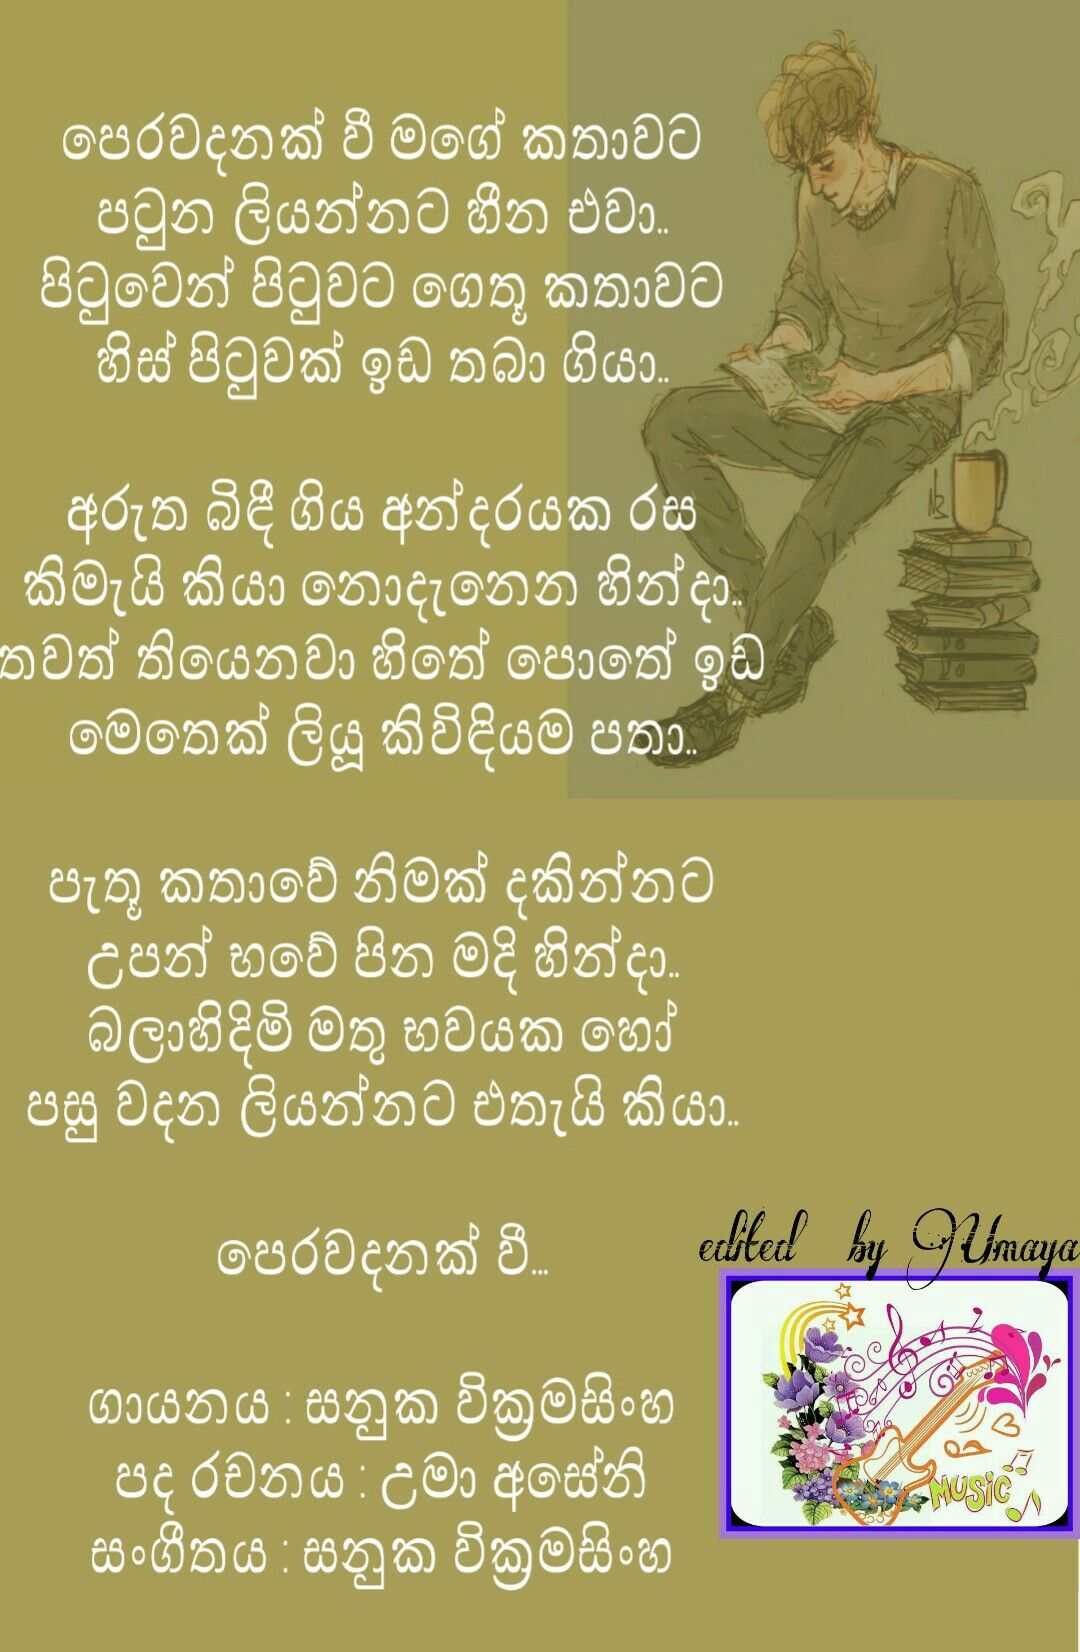 Artist Sanuka wikramasinghe. (Sinhala Song Lyrics